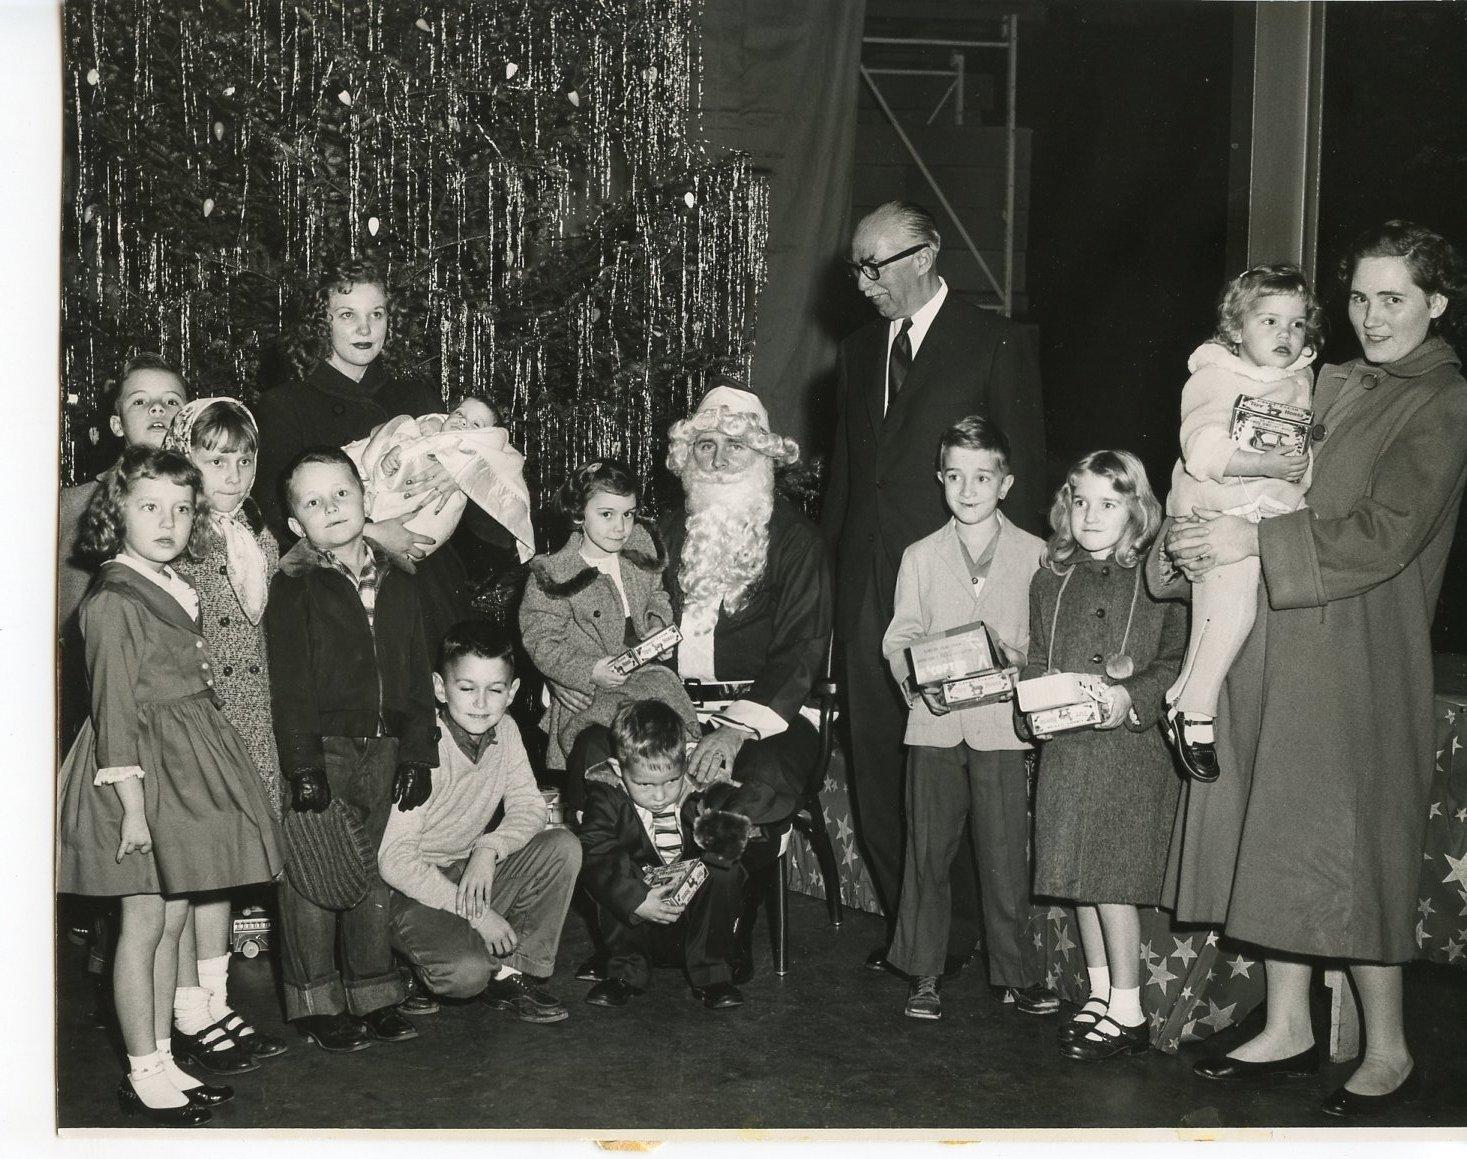 Group with Santa